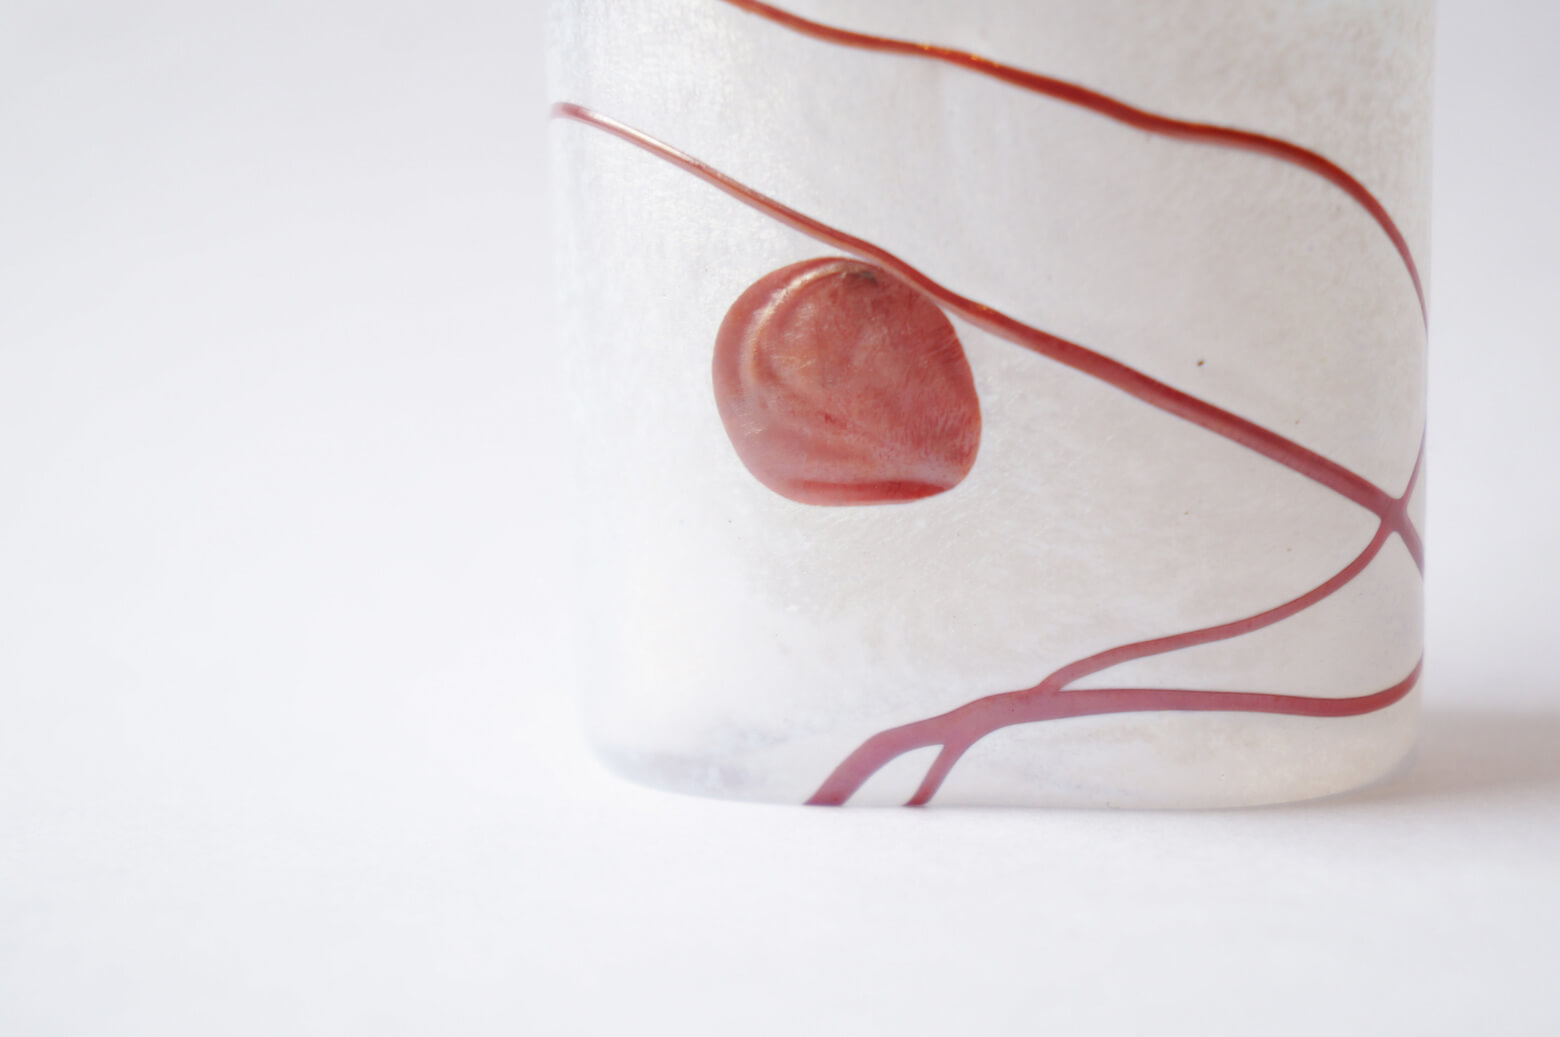 Kosta Boda Bertil Vallien Galaxy Miniature Vase/バーティル・ヴァリーン コスタ ボダ ギャラクシー ミニチュア ベース ガラス 北欧雑貨